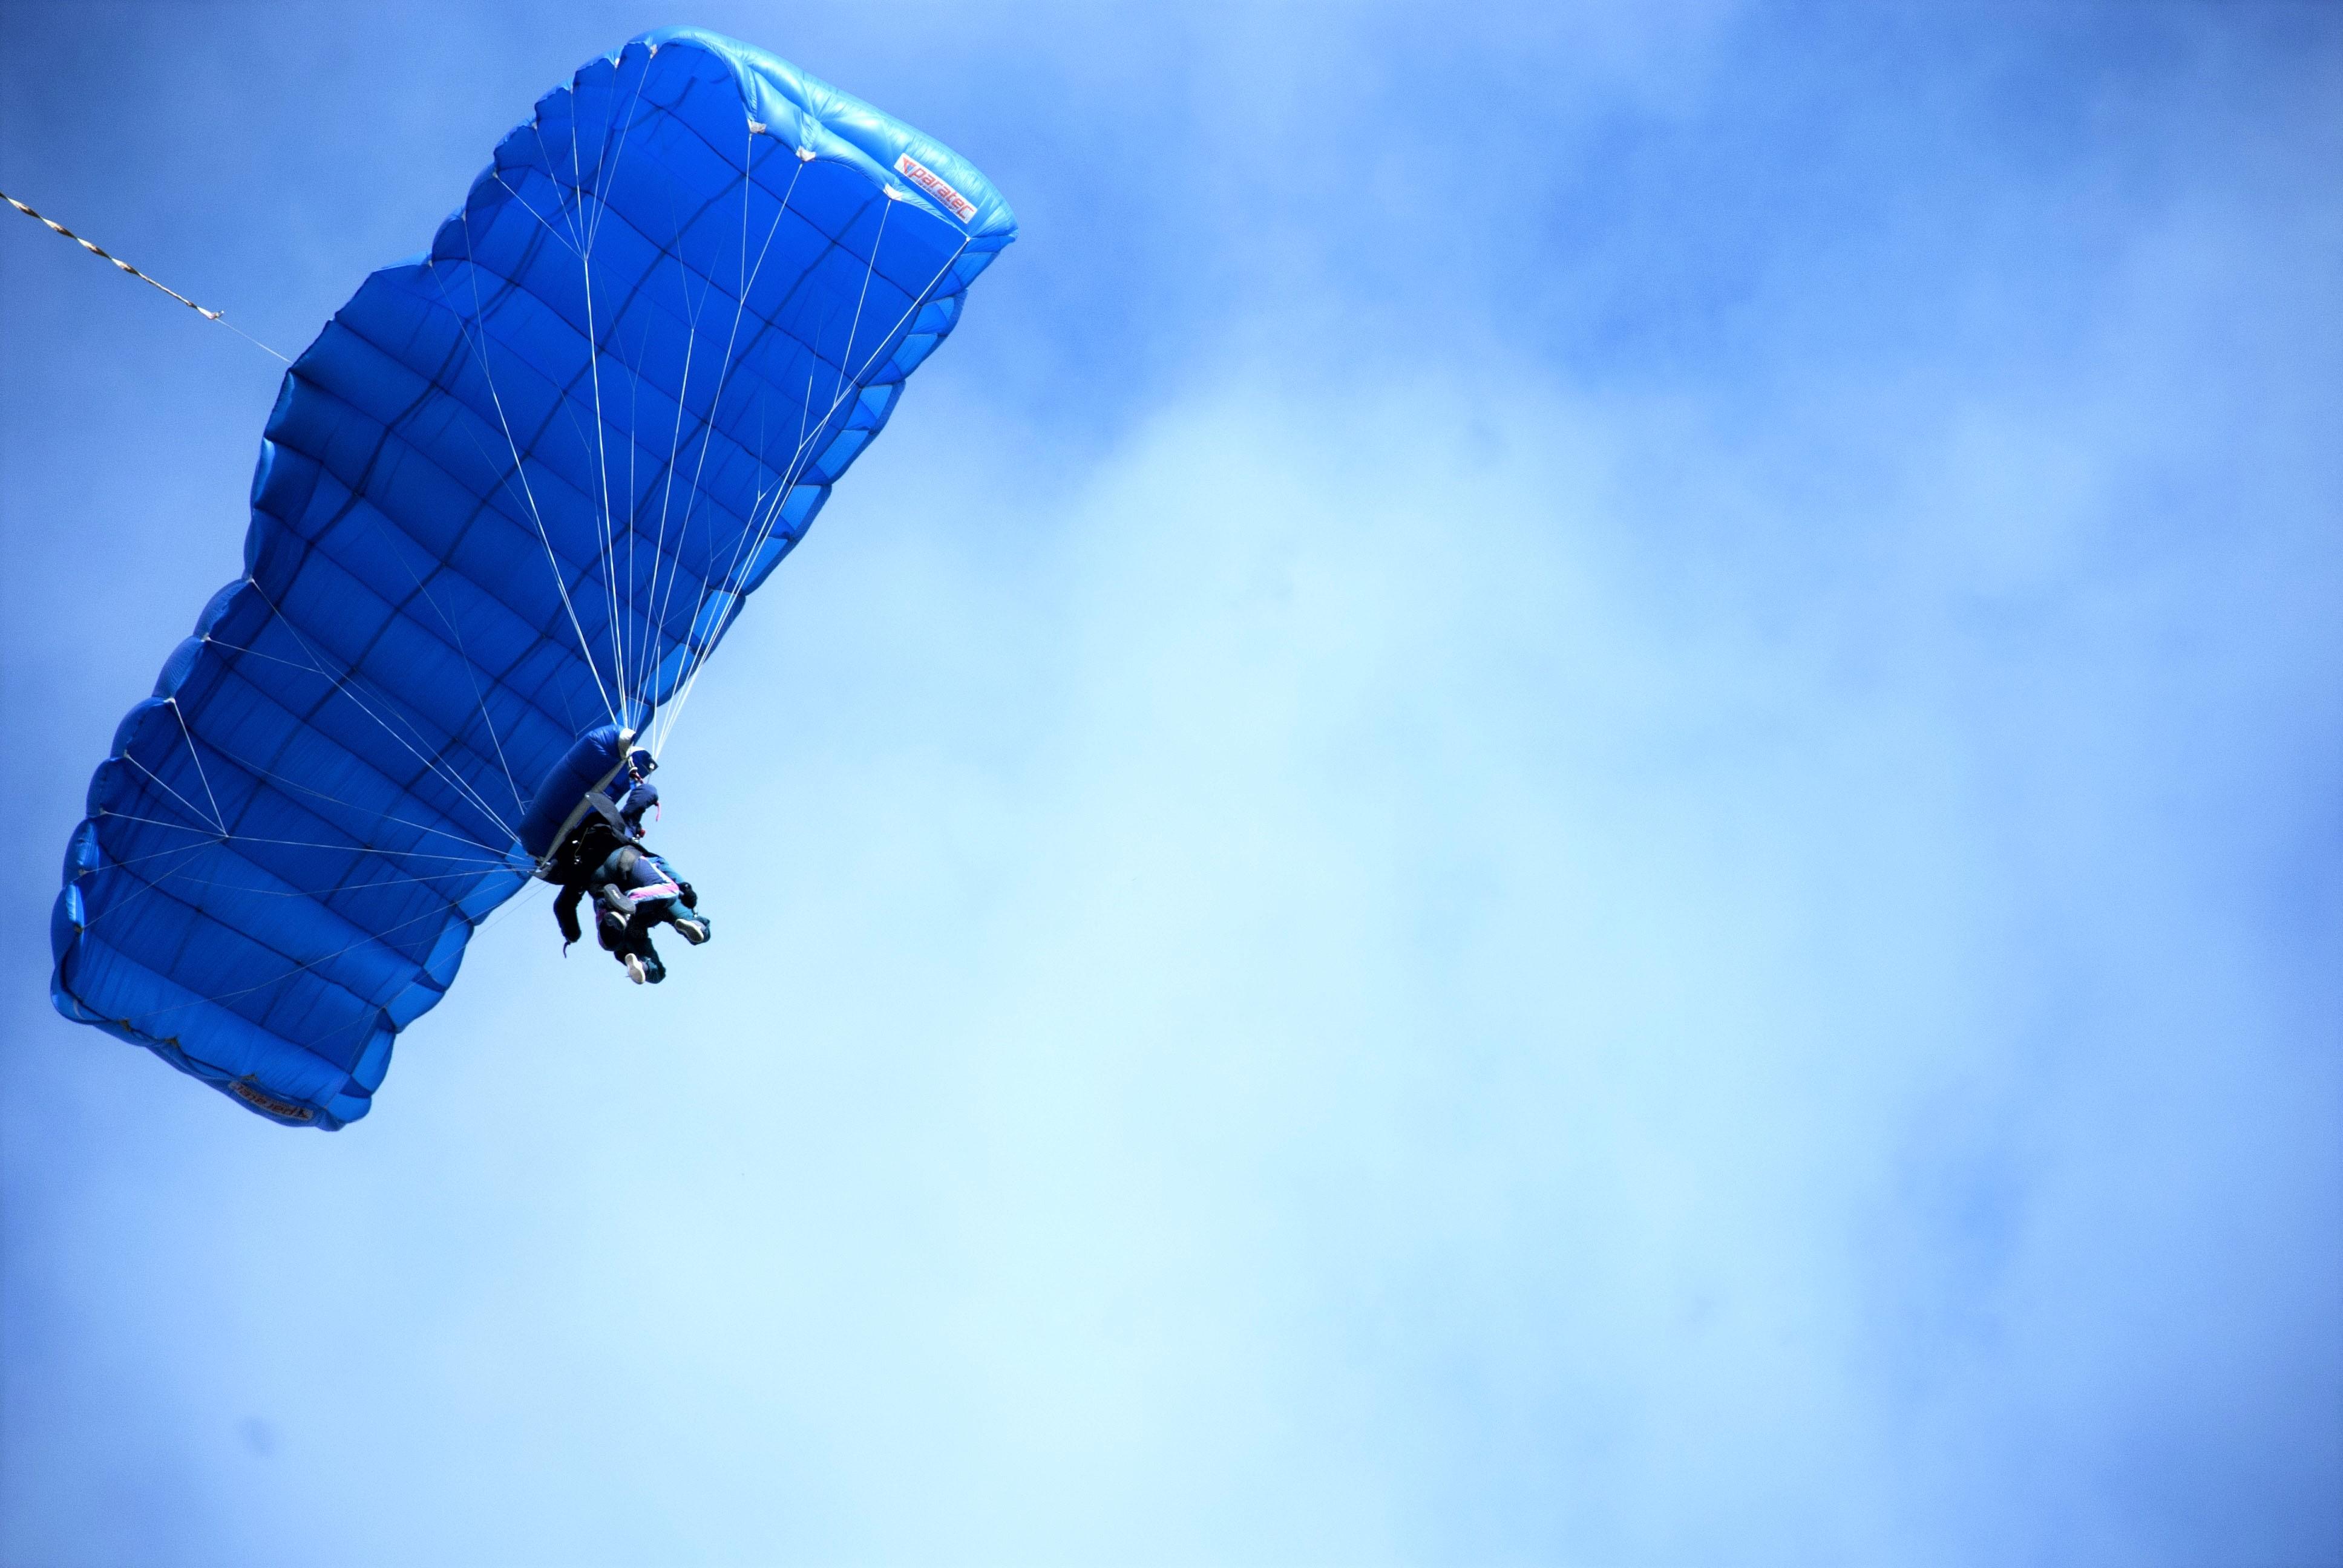 Mavin Commercial Executive Daisy Sumner's Parachute Jump